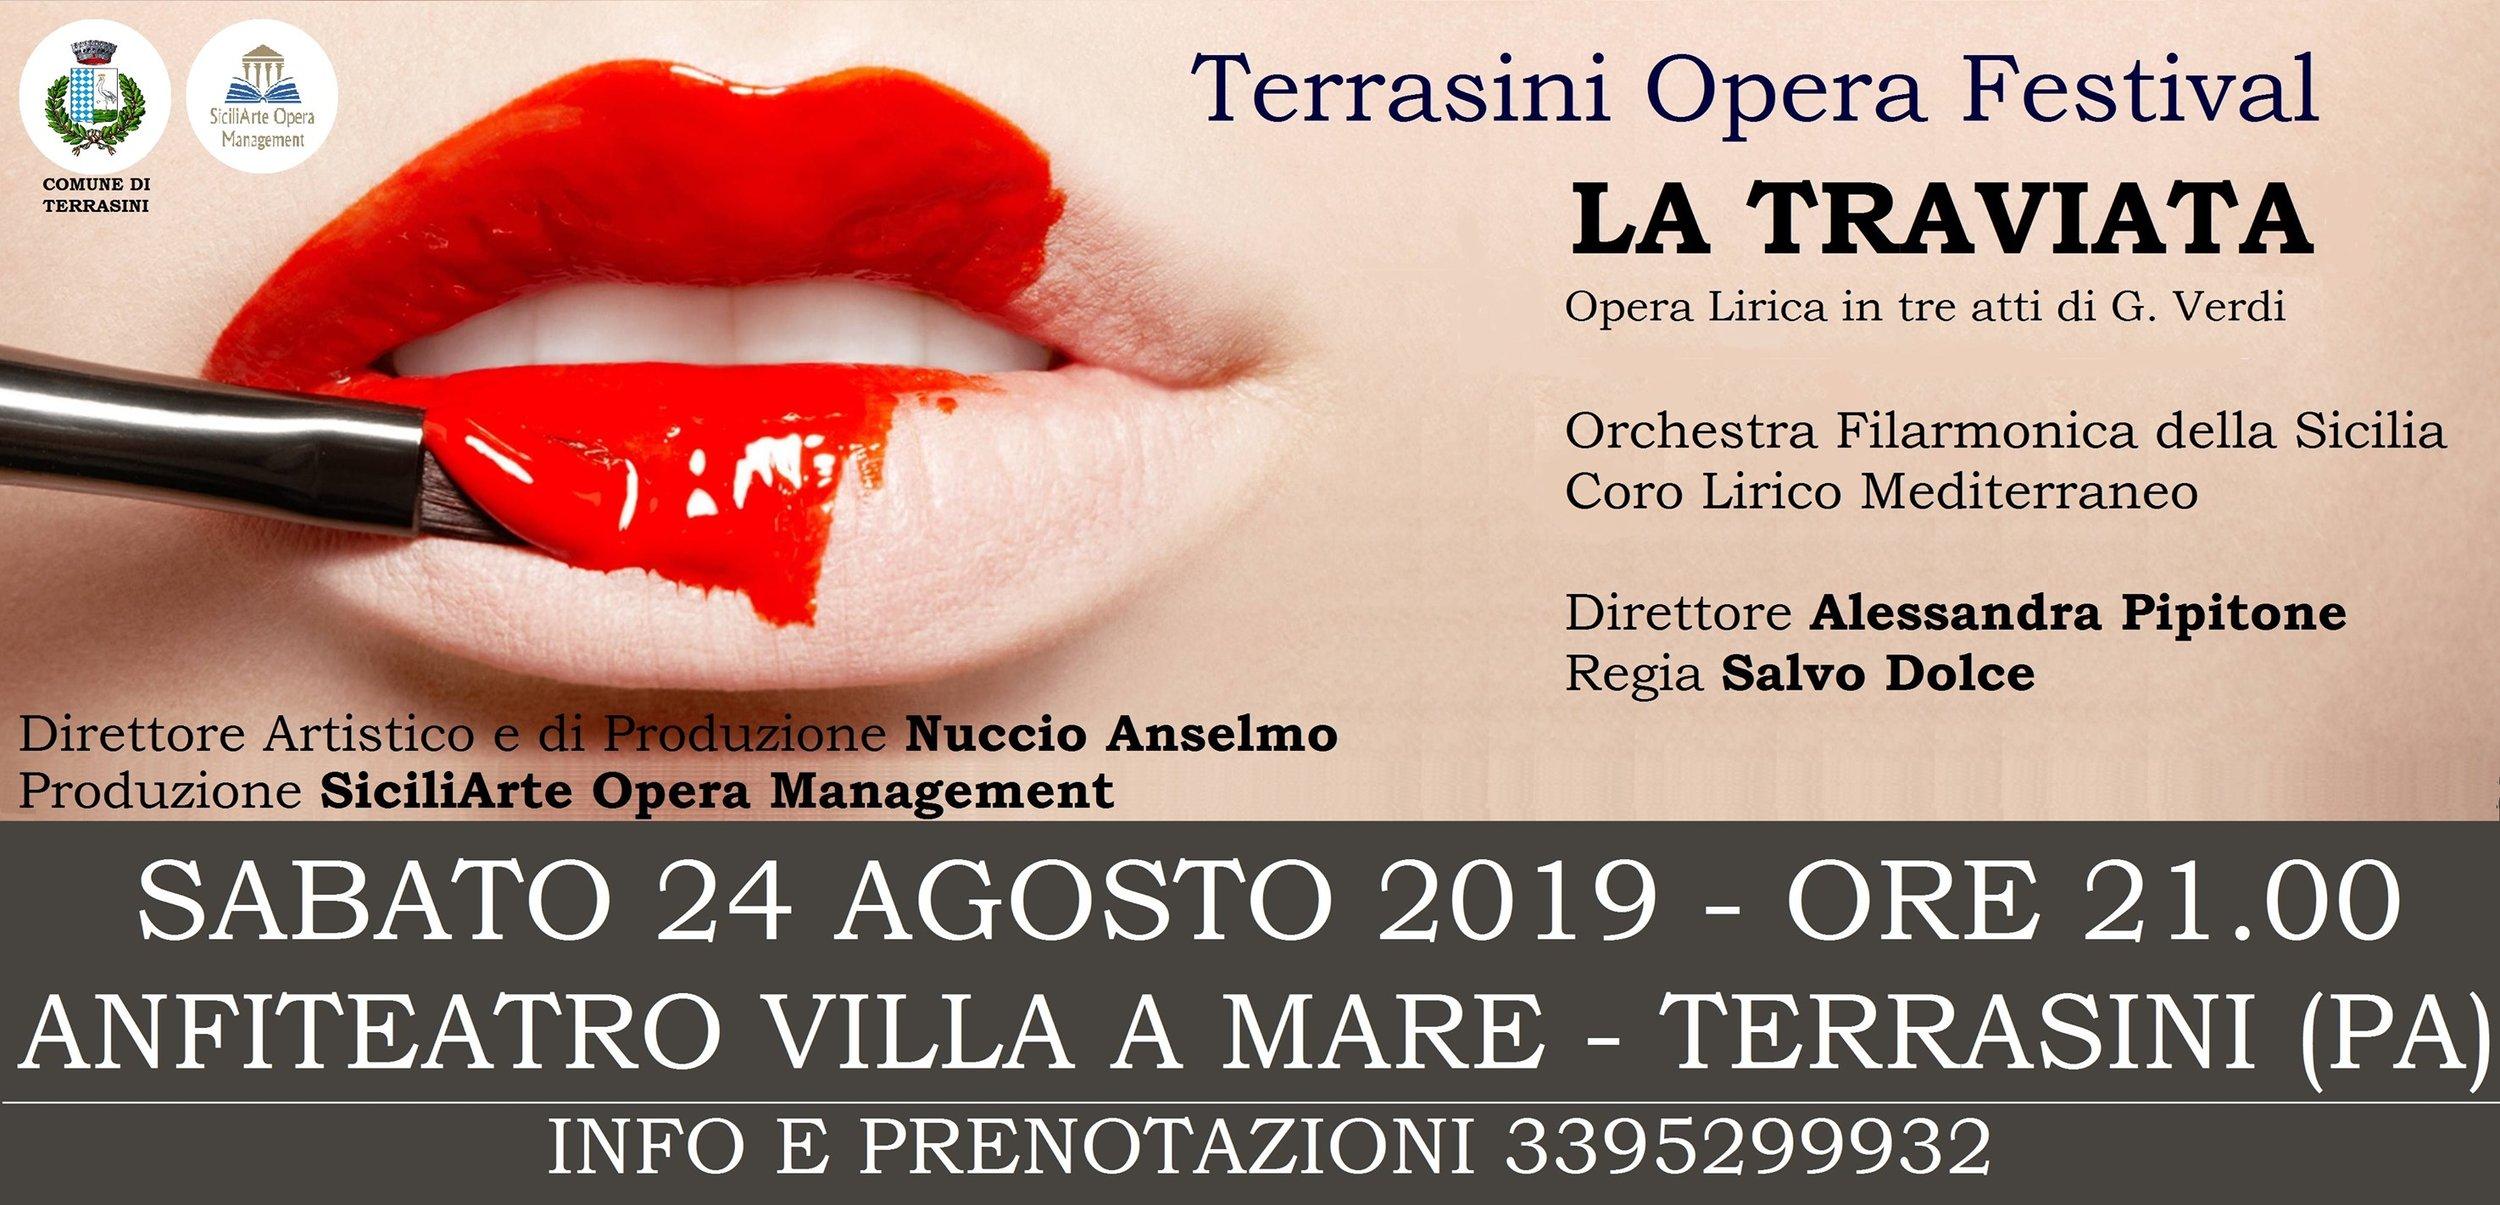 terrasini opera festival la traviata.jpg